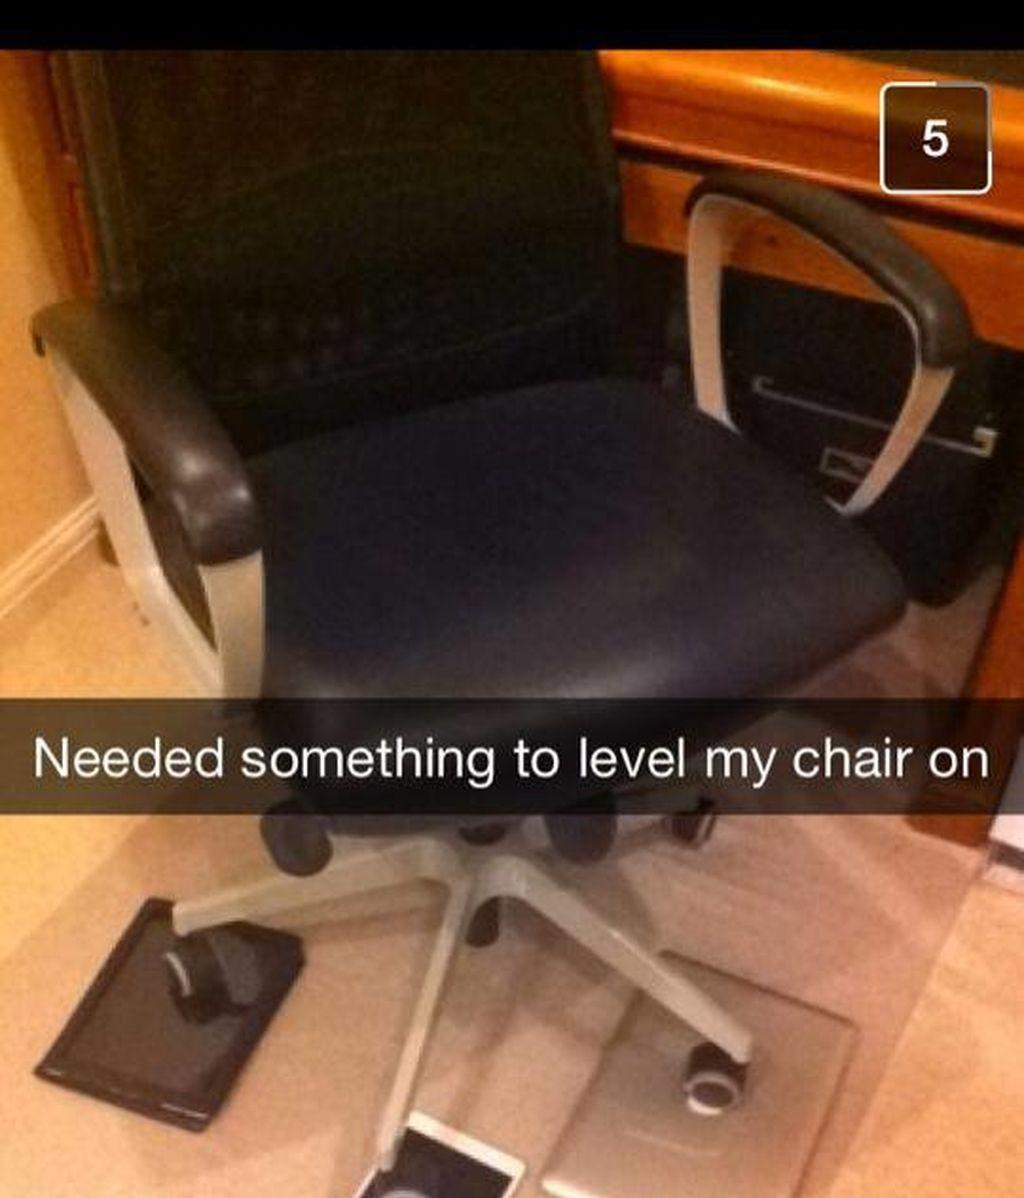 ¿Cómo elevo mi silla?